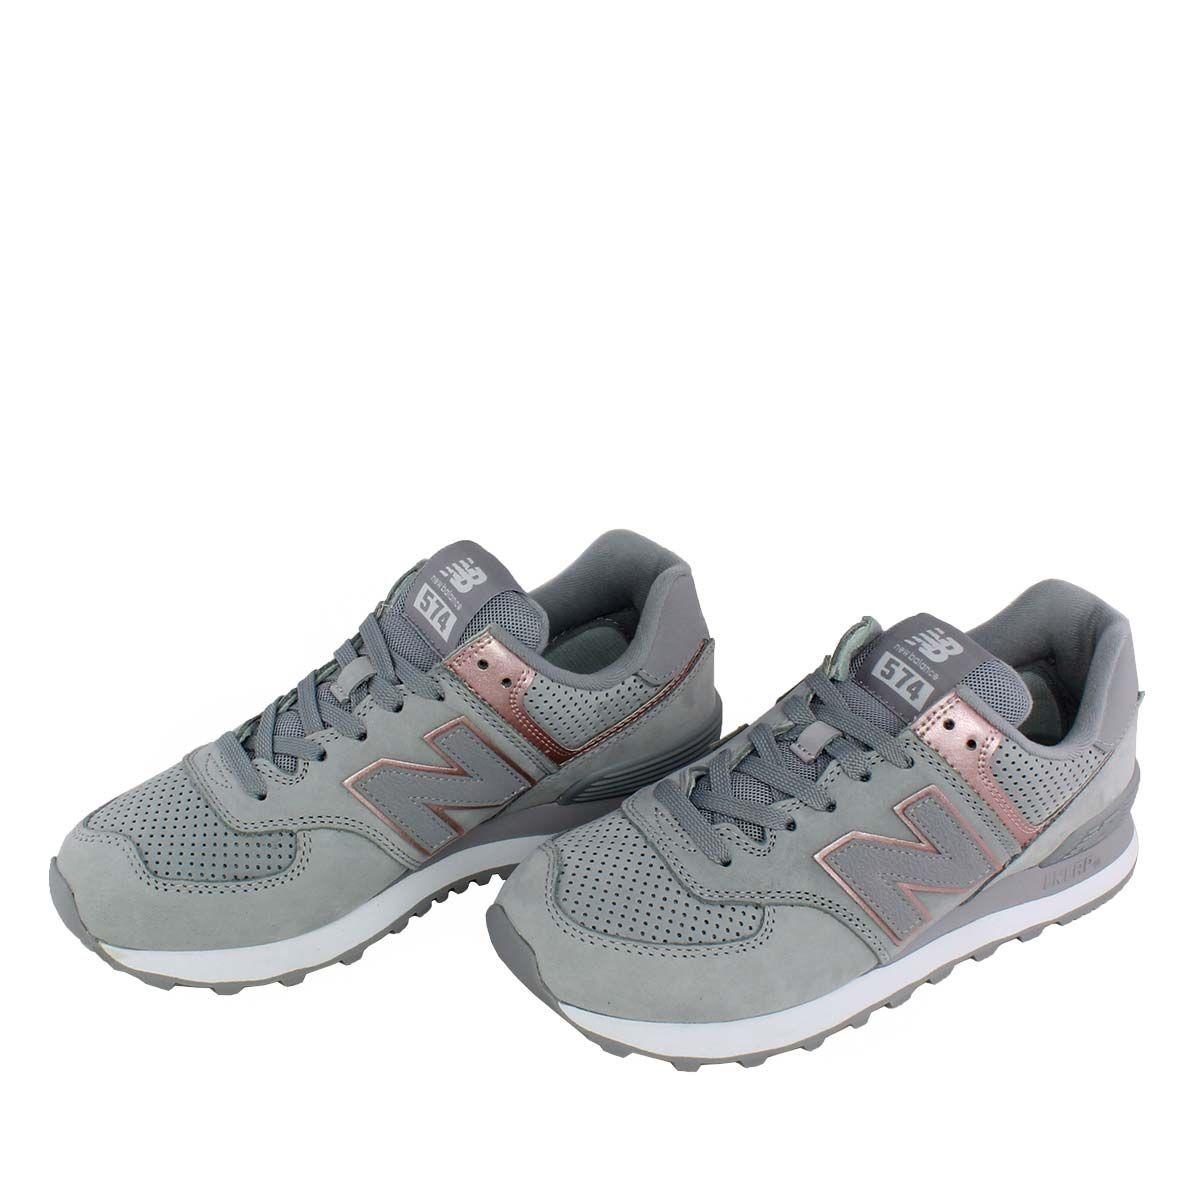 hot sale online cff0d a3800 New Balance 574 Nubuck γκρι, διαχρονικά sneaker icons της ...